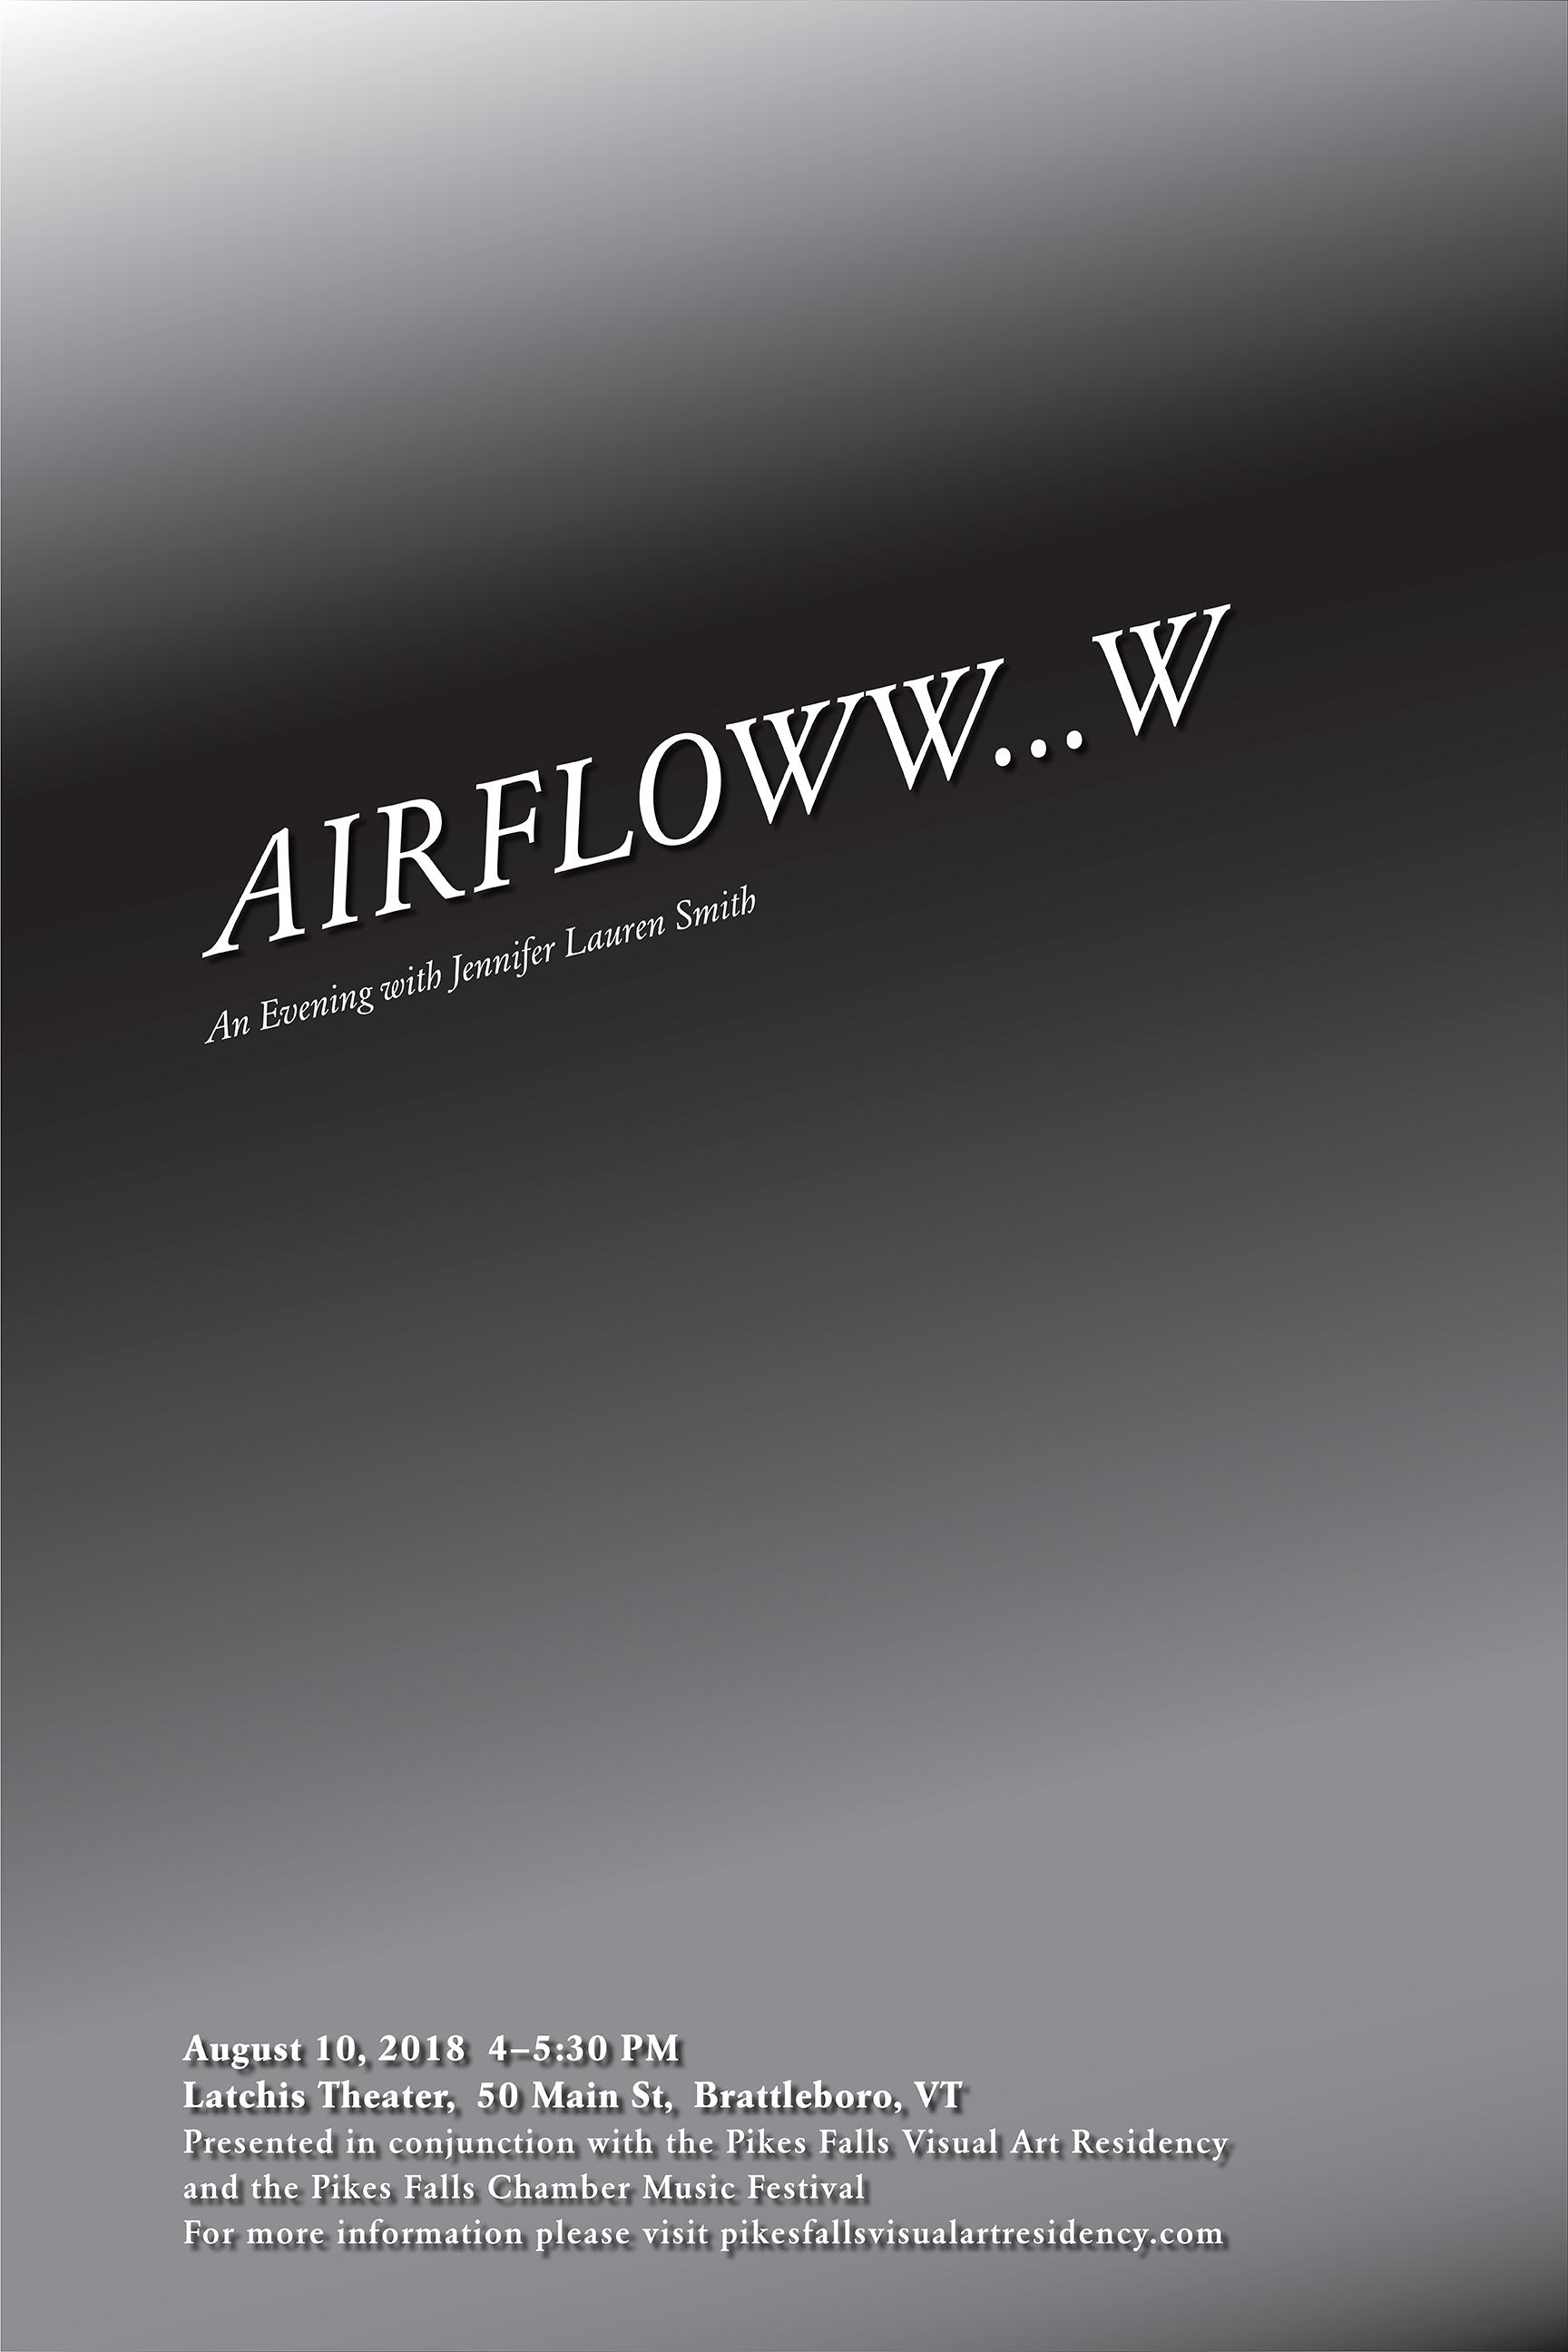 airflowww.jpg